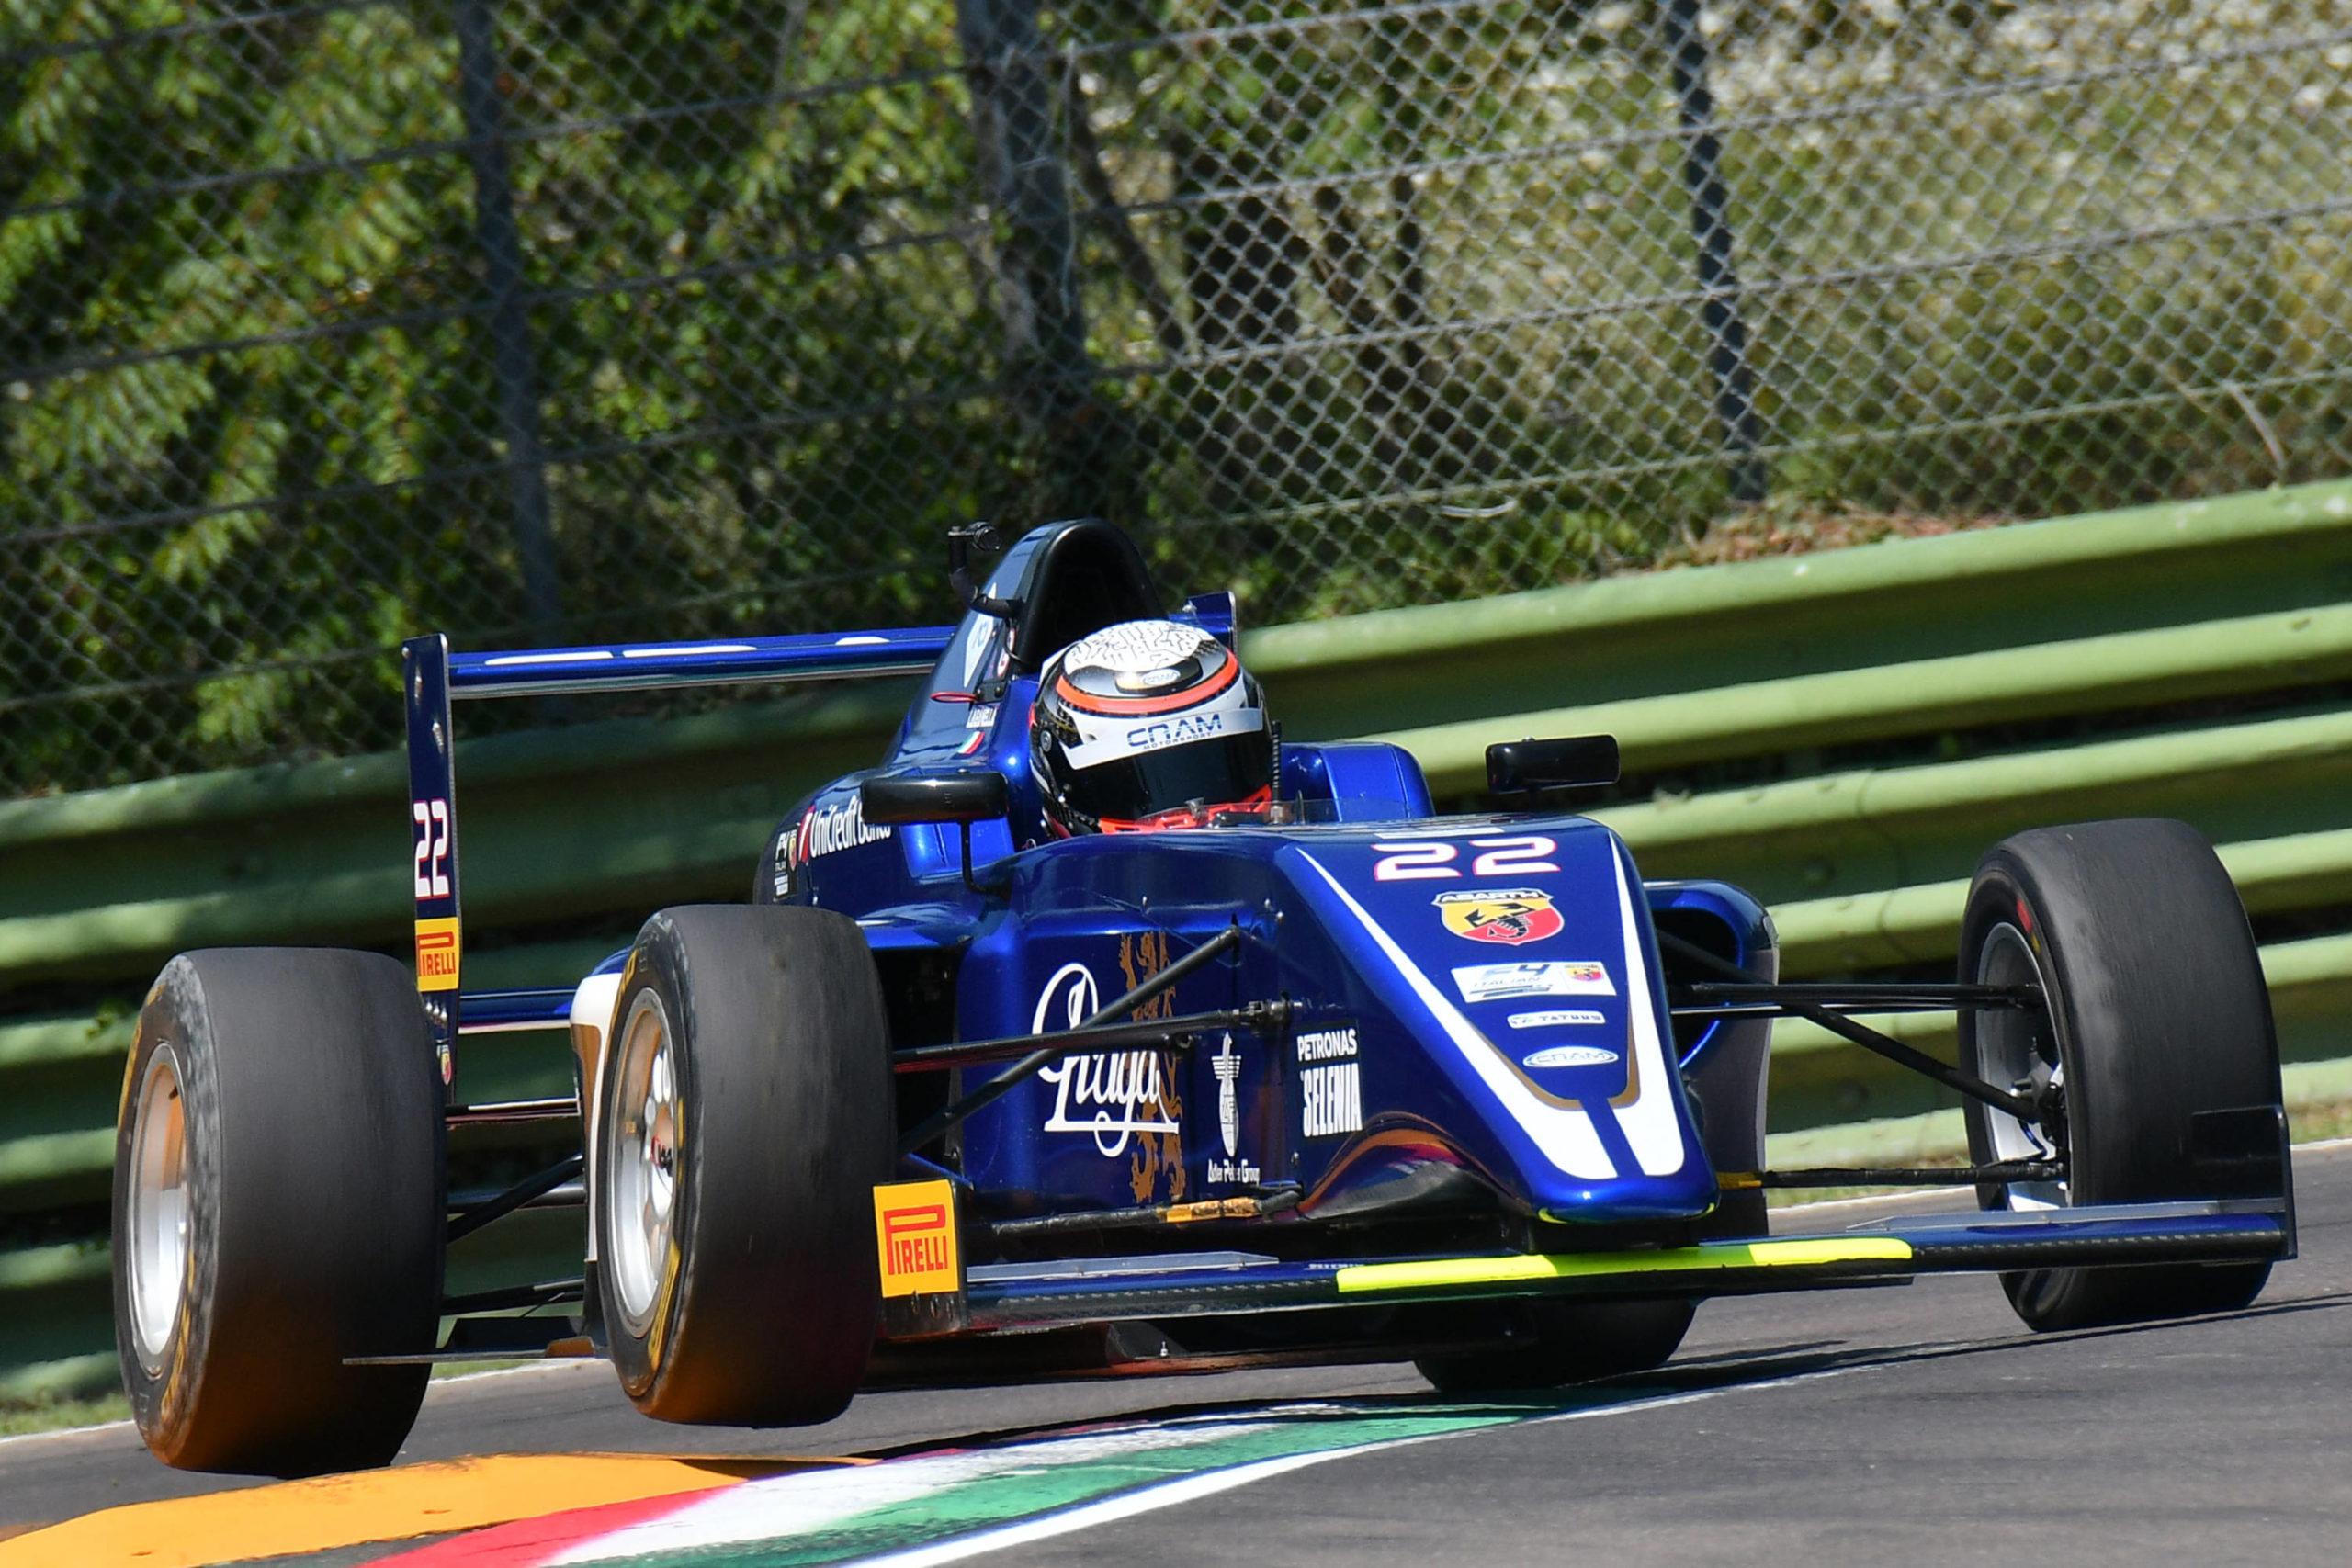 From karts to formulas: Praga and CRAM long-term partnership